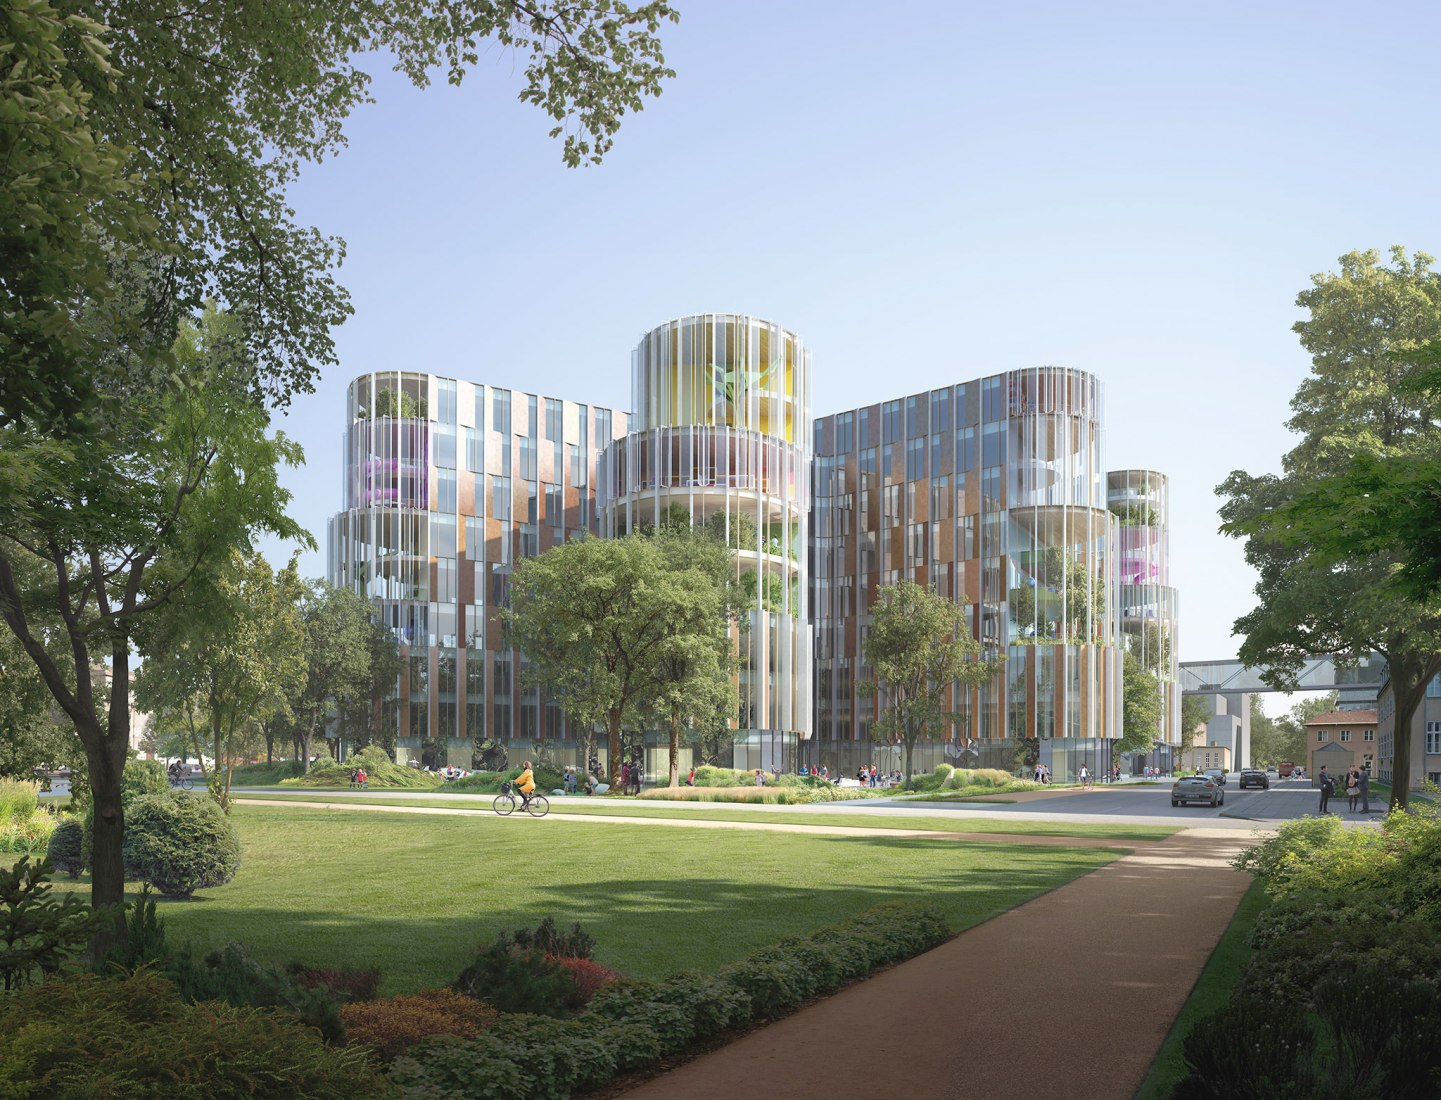 Vista exterior. Nuevo Hospital Nacional de Niños, BørneRiget por 3xn Arkitekter